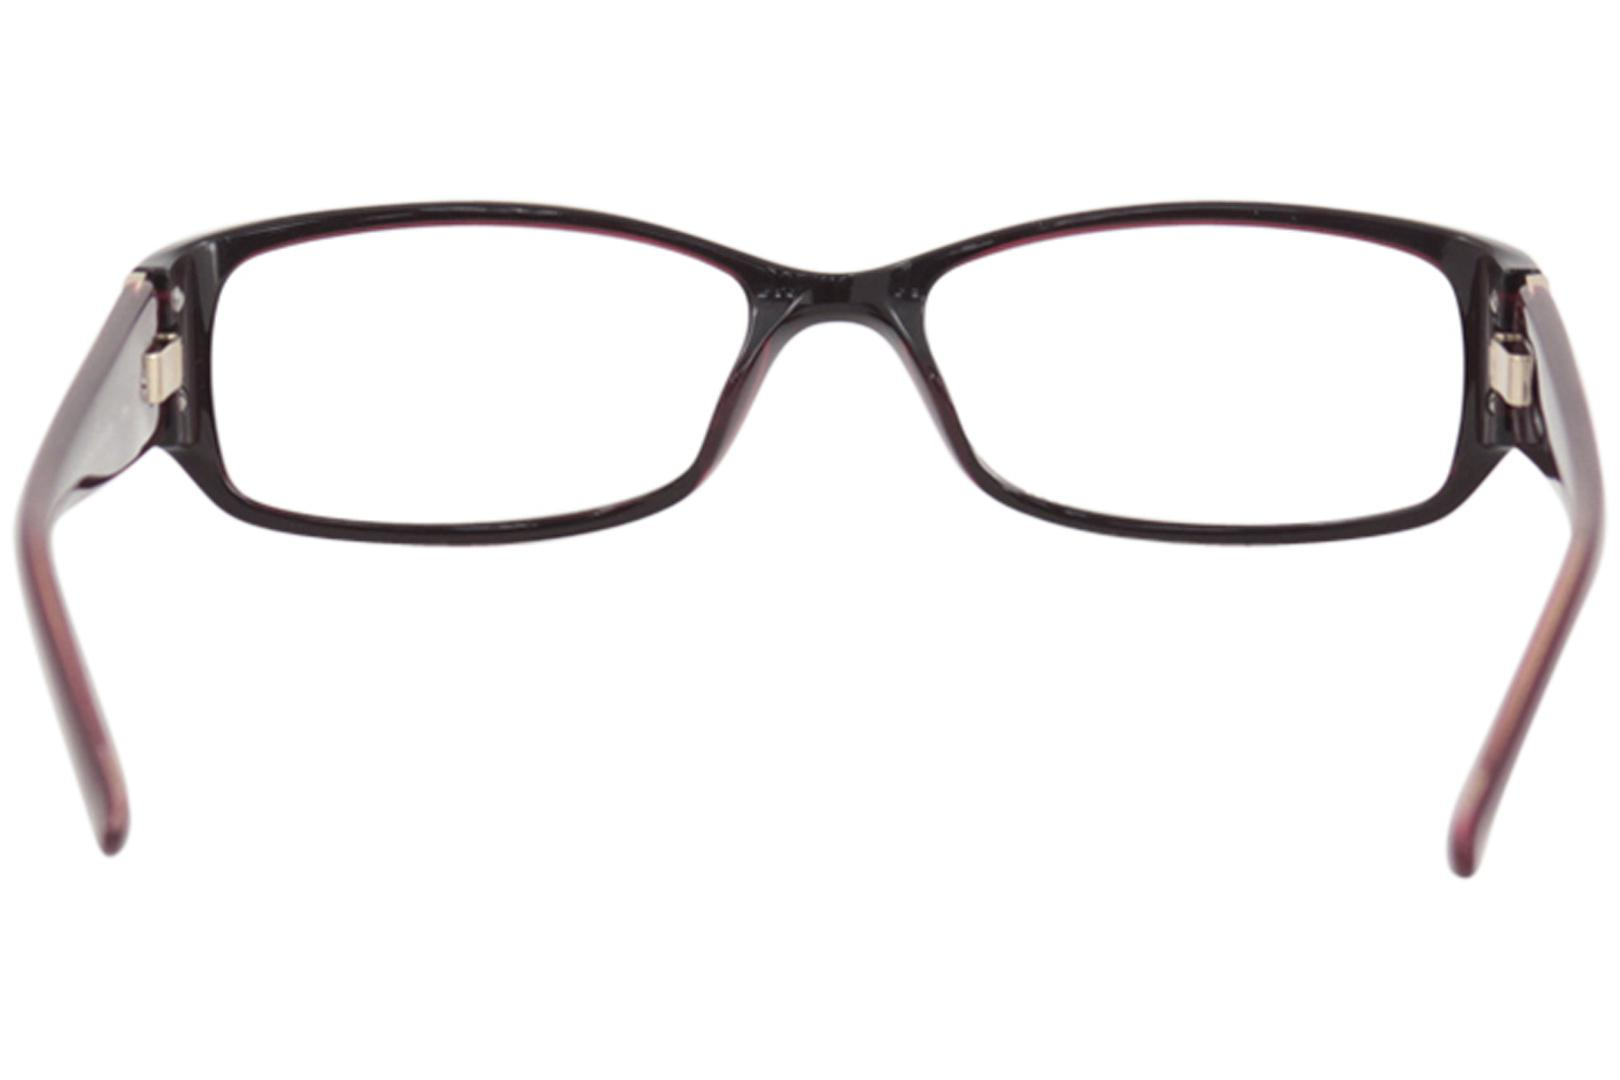 c97163bc3b Bebe Women s Glitzy Eyeglasses BB5060 BB 5060 Optical Frame